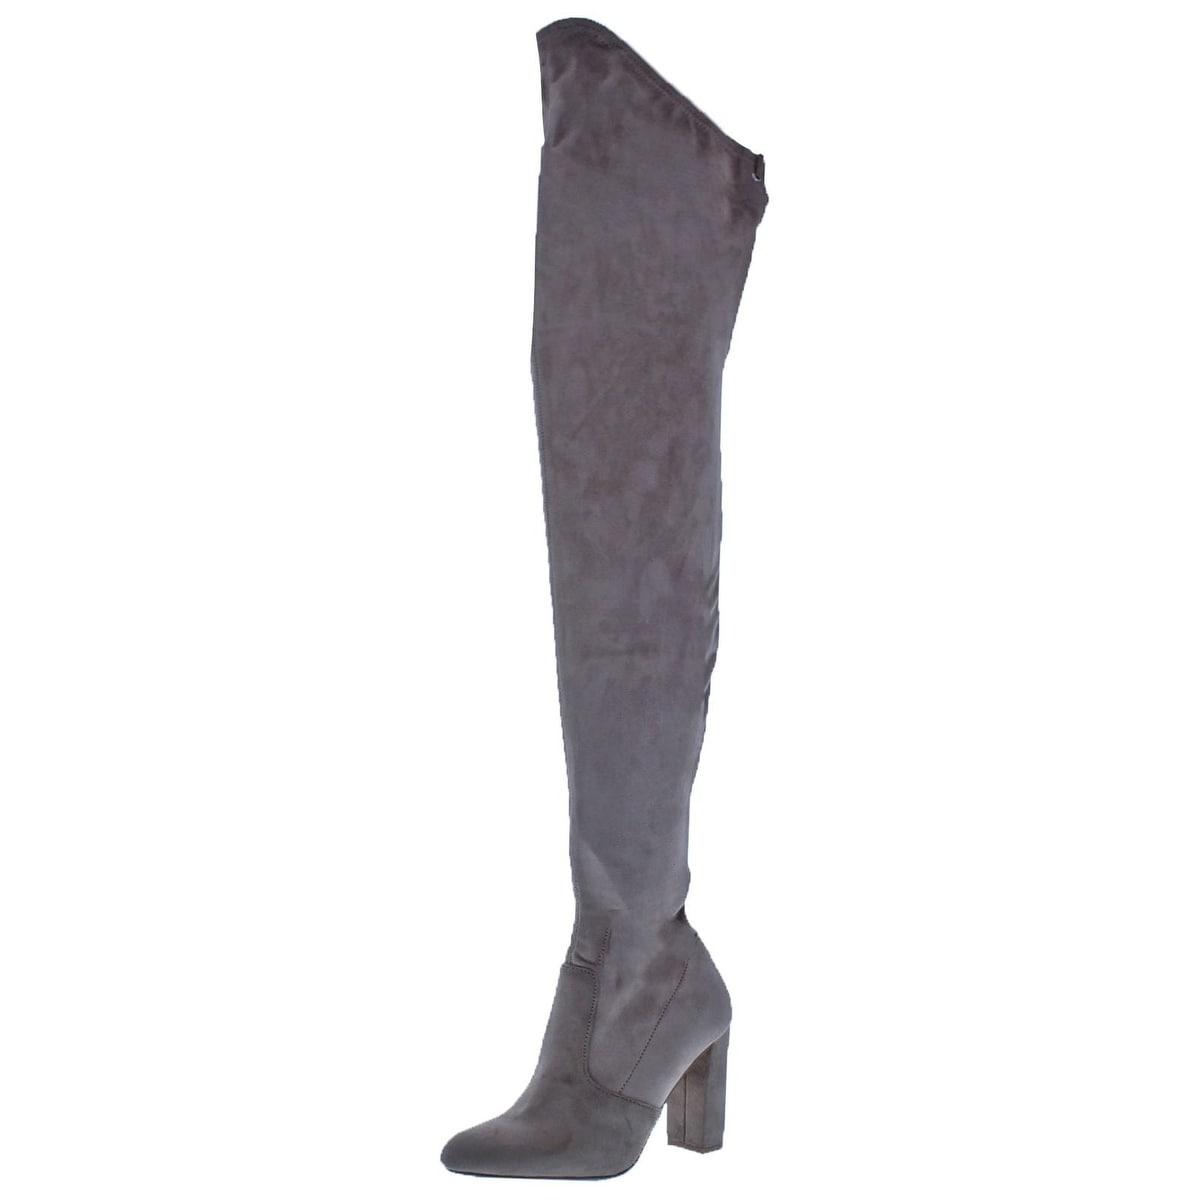 Steve Madden Womens Elektric Thigh High Boots Faux Suede Tall